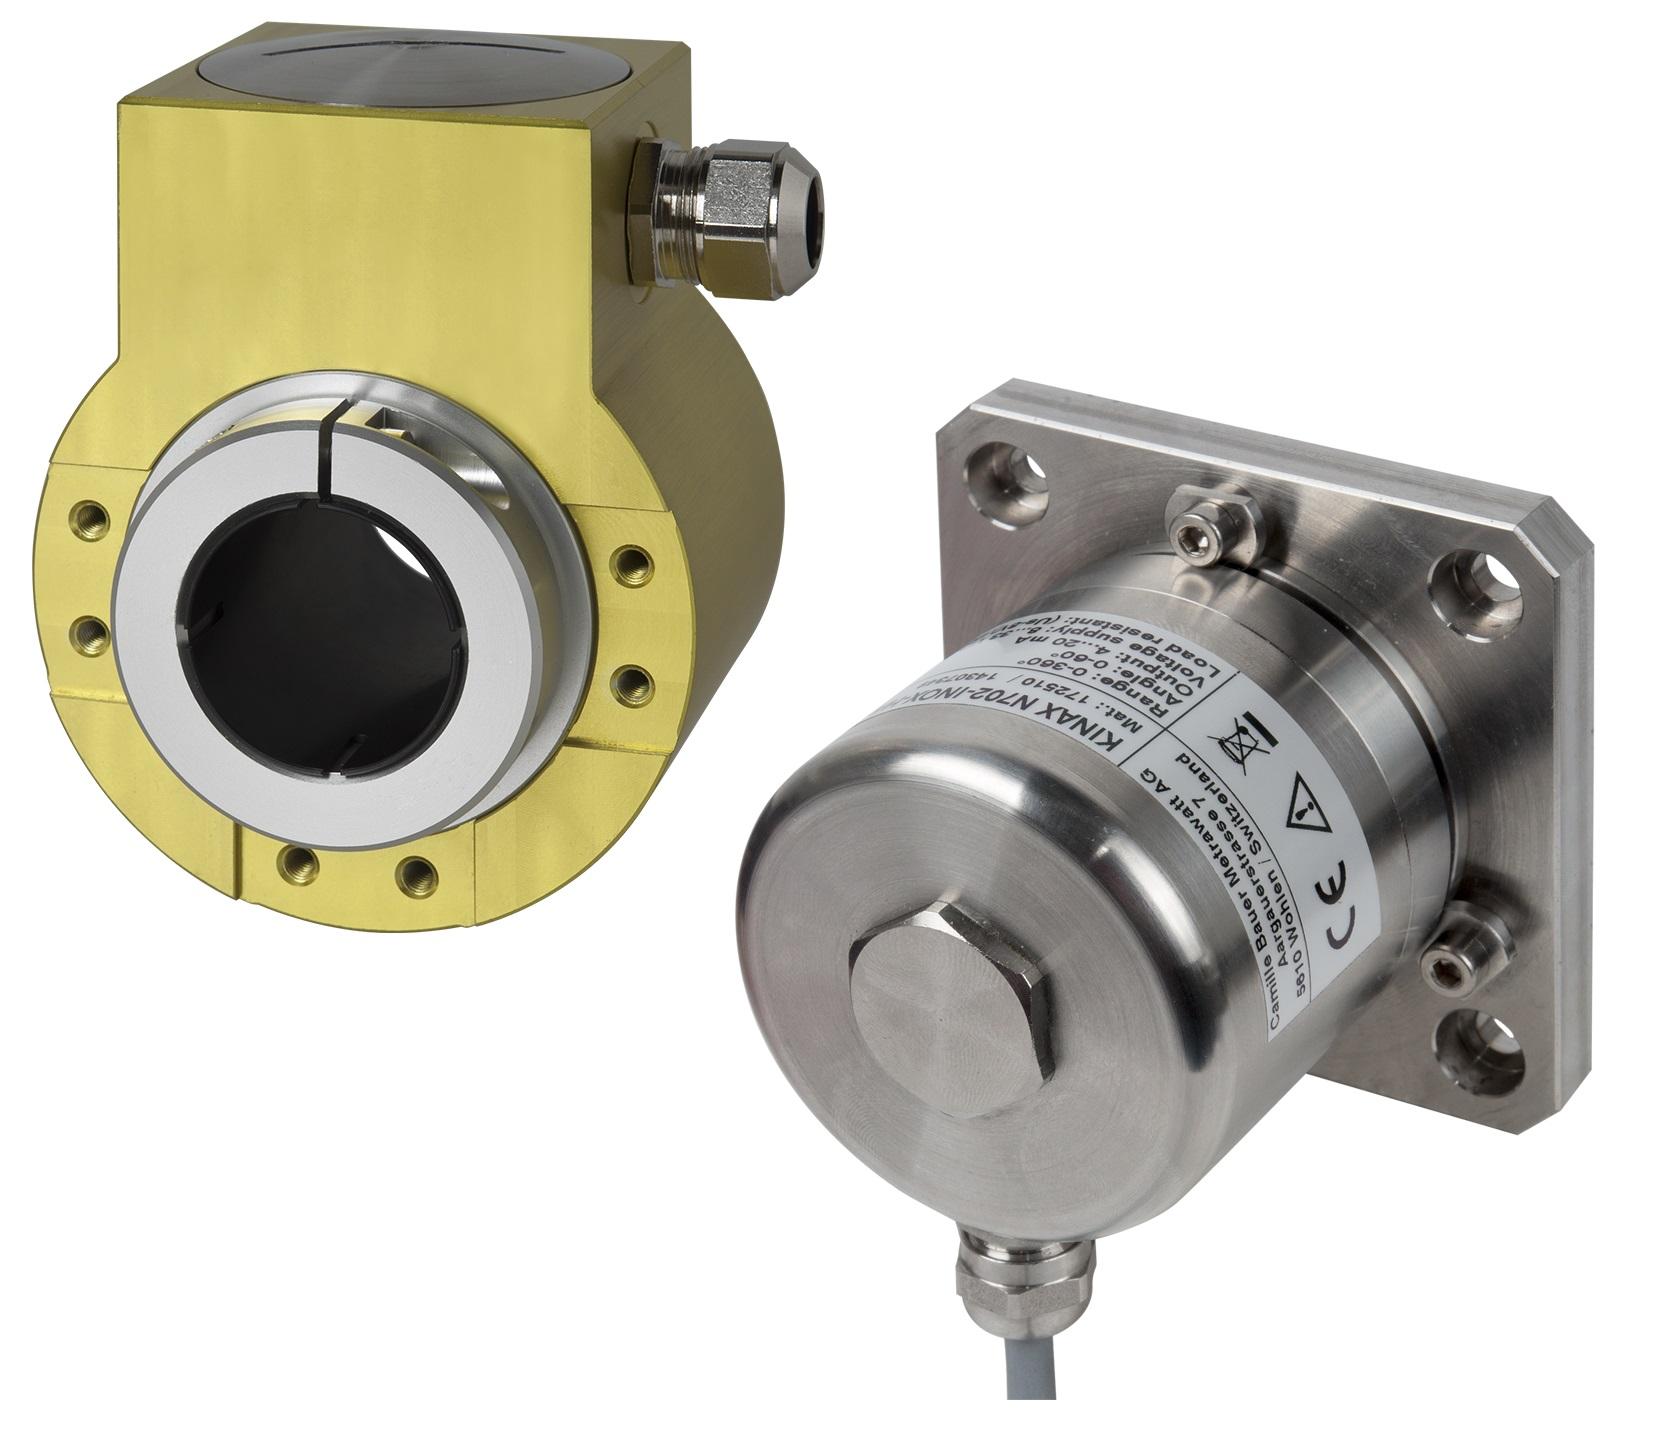 Robust rotary transmitters and tilt sensors